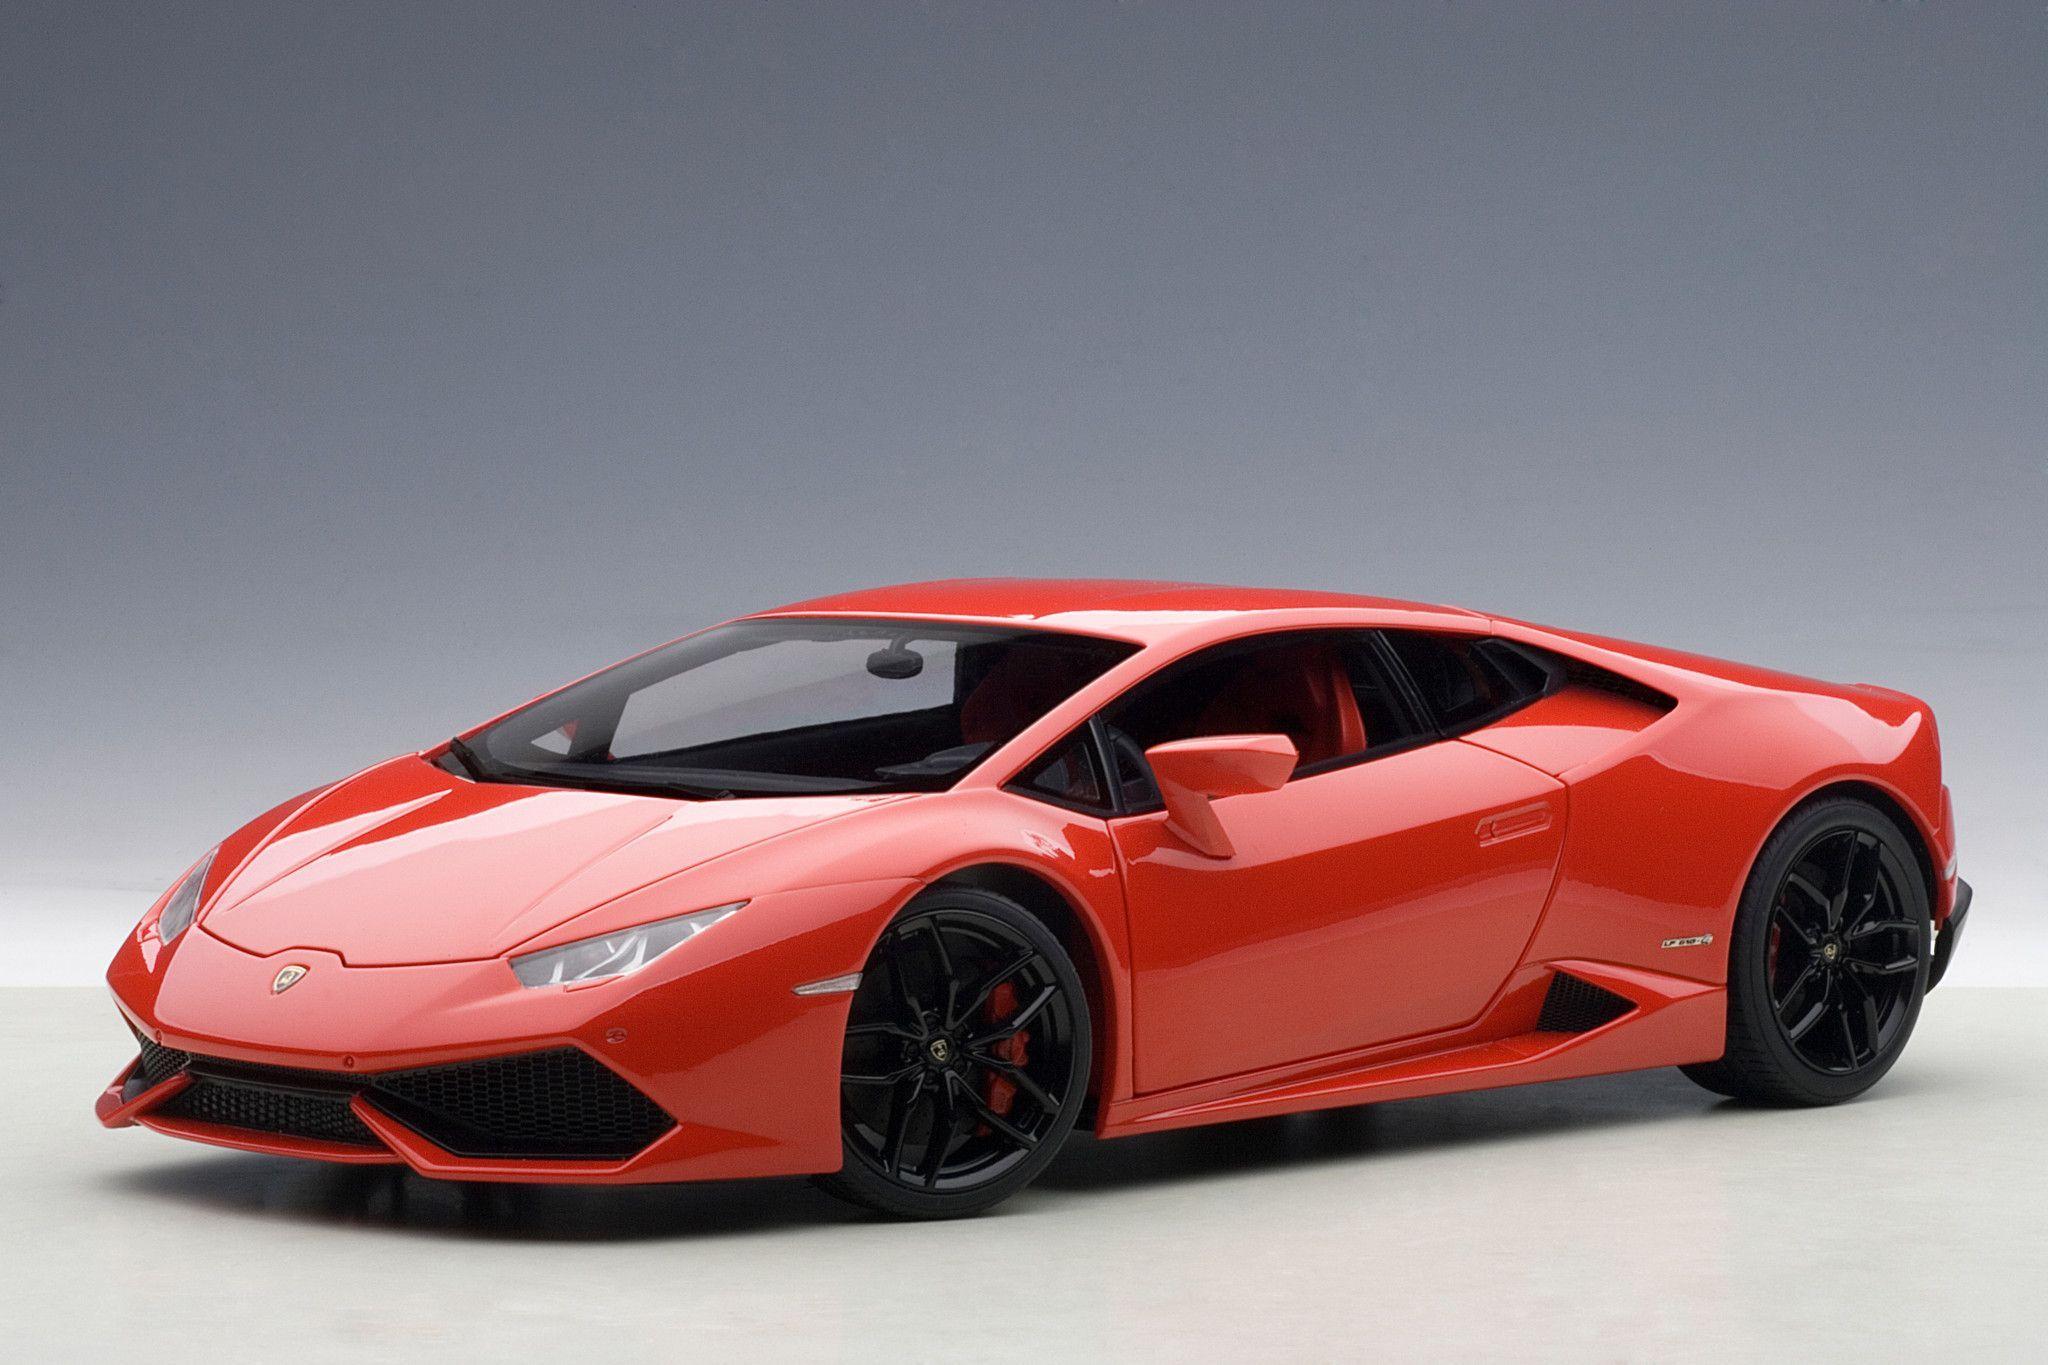 69e4e15be1a609f38f2bd082dc4fce5c Astounding Lamborghini Countach Built In Basement Cars Trend